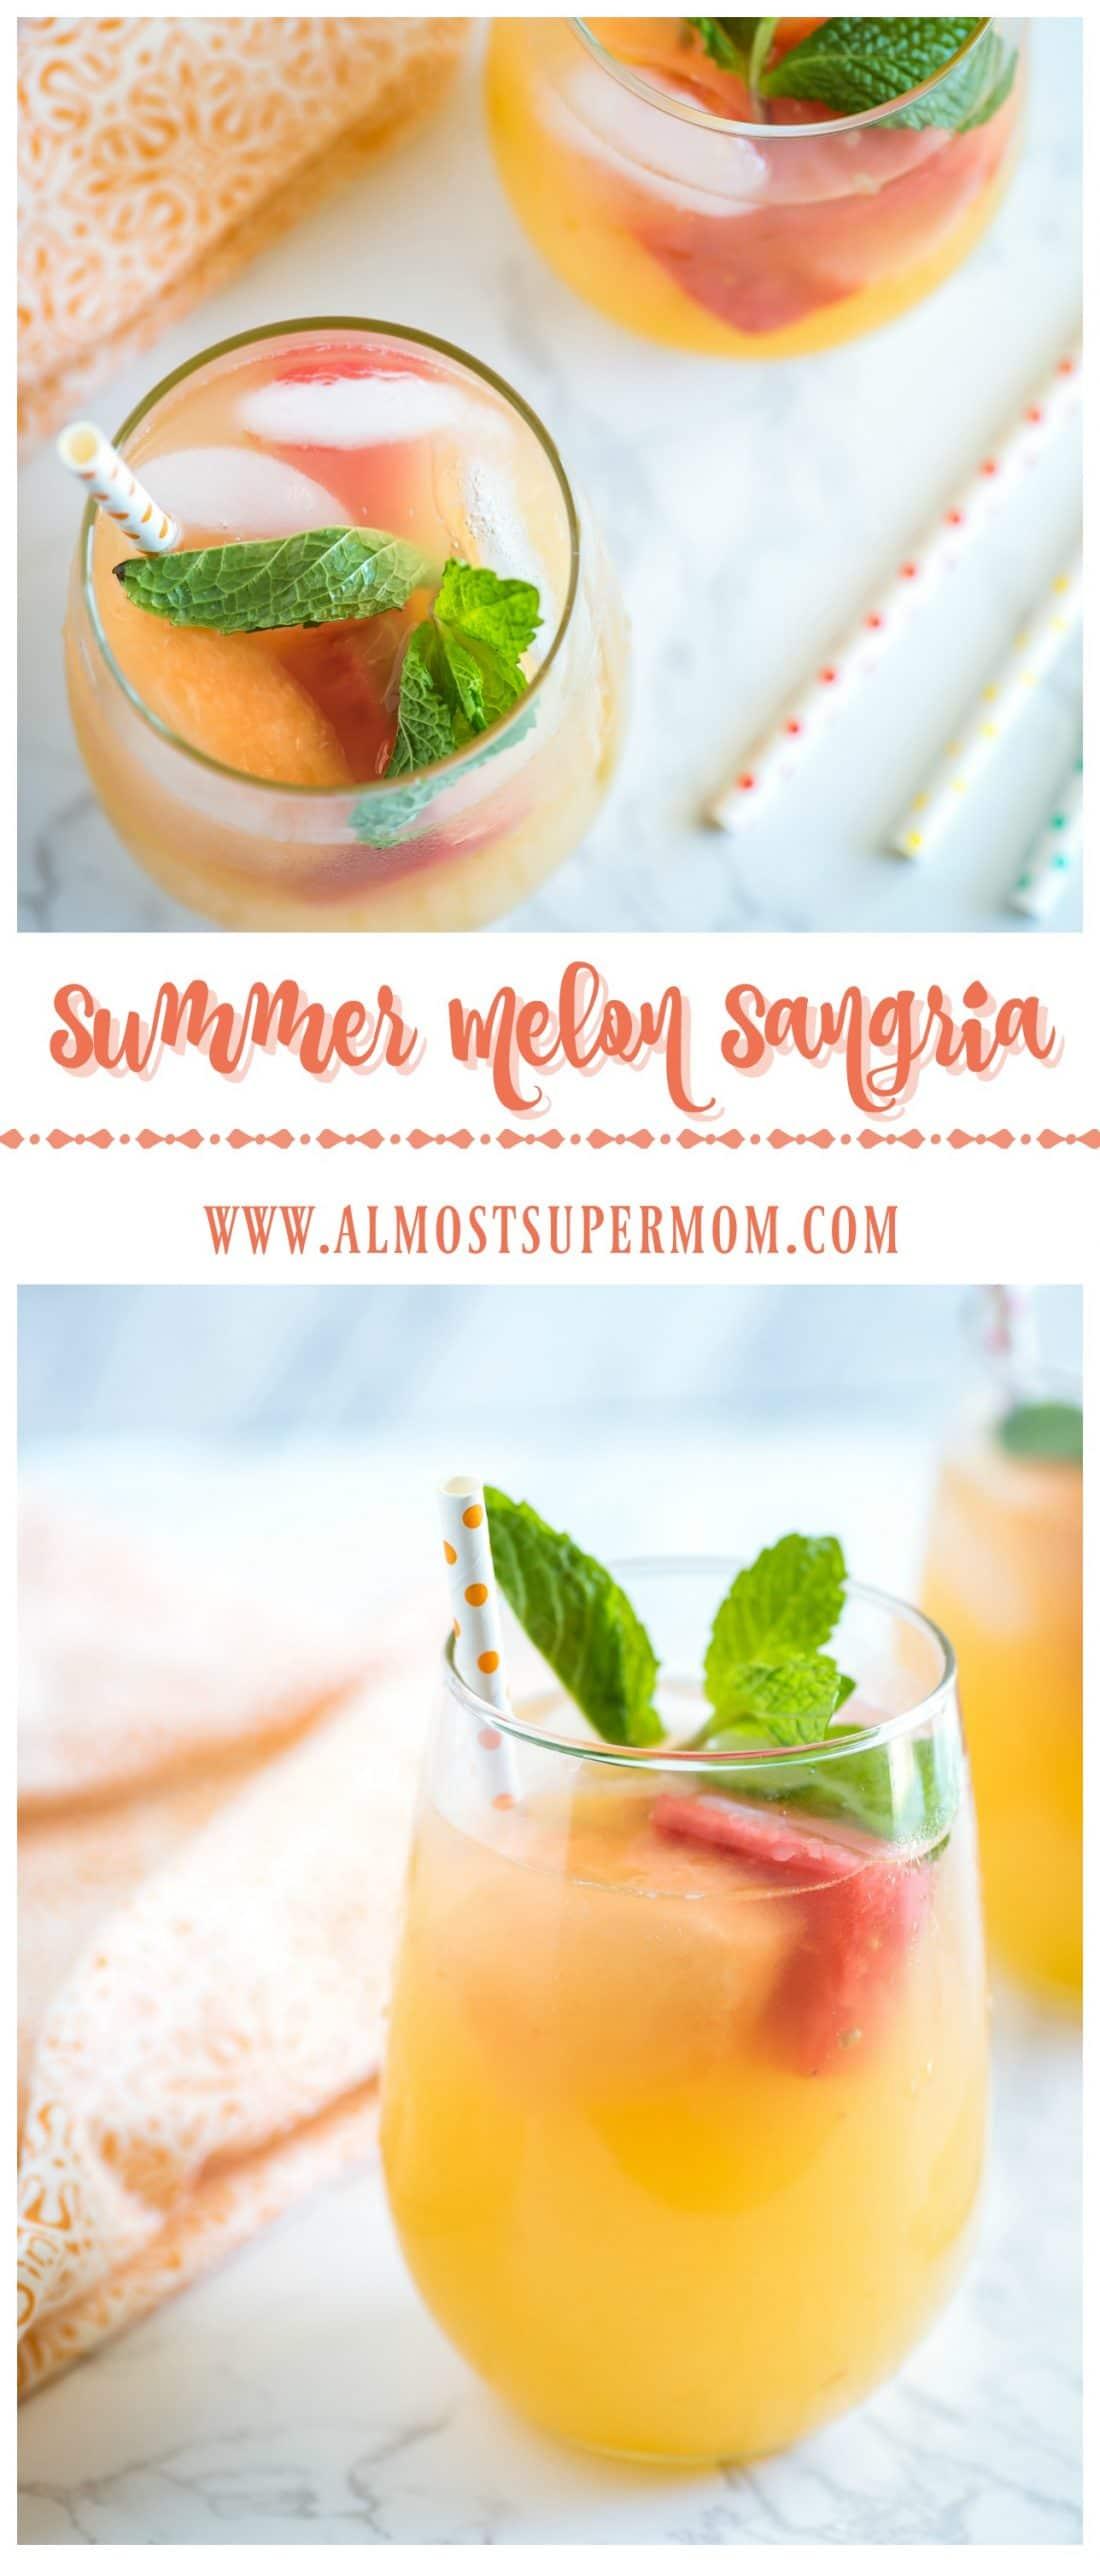 Summer Melon Sangria